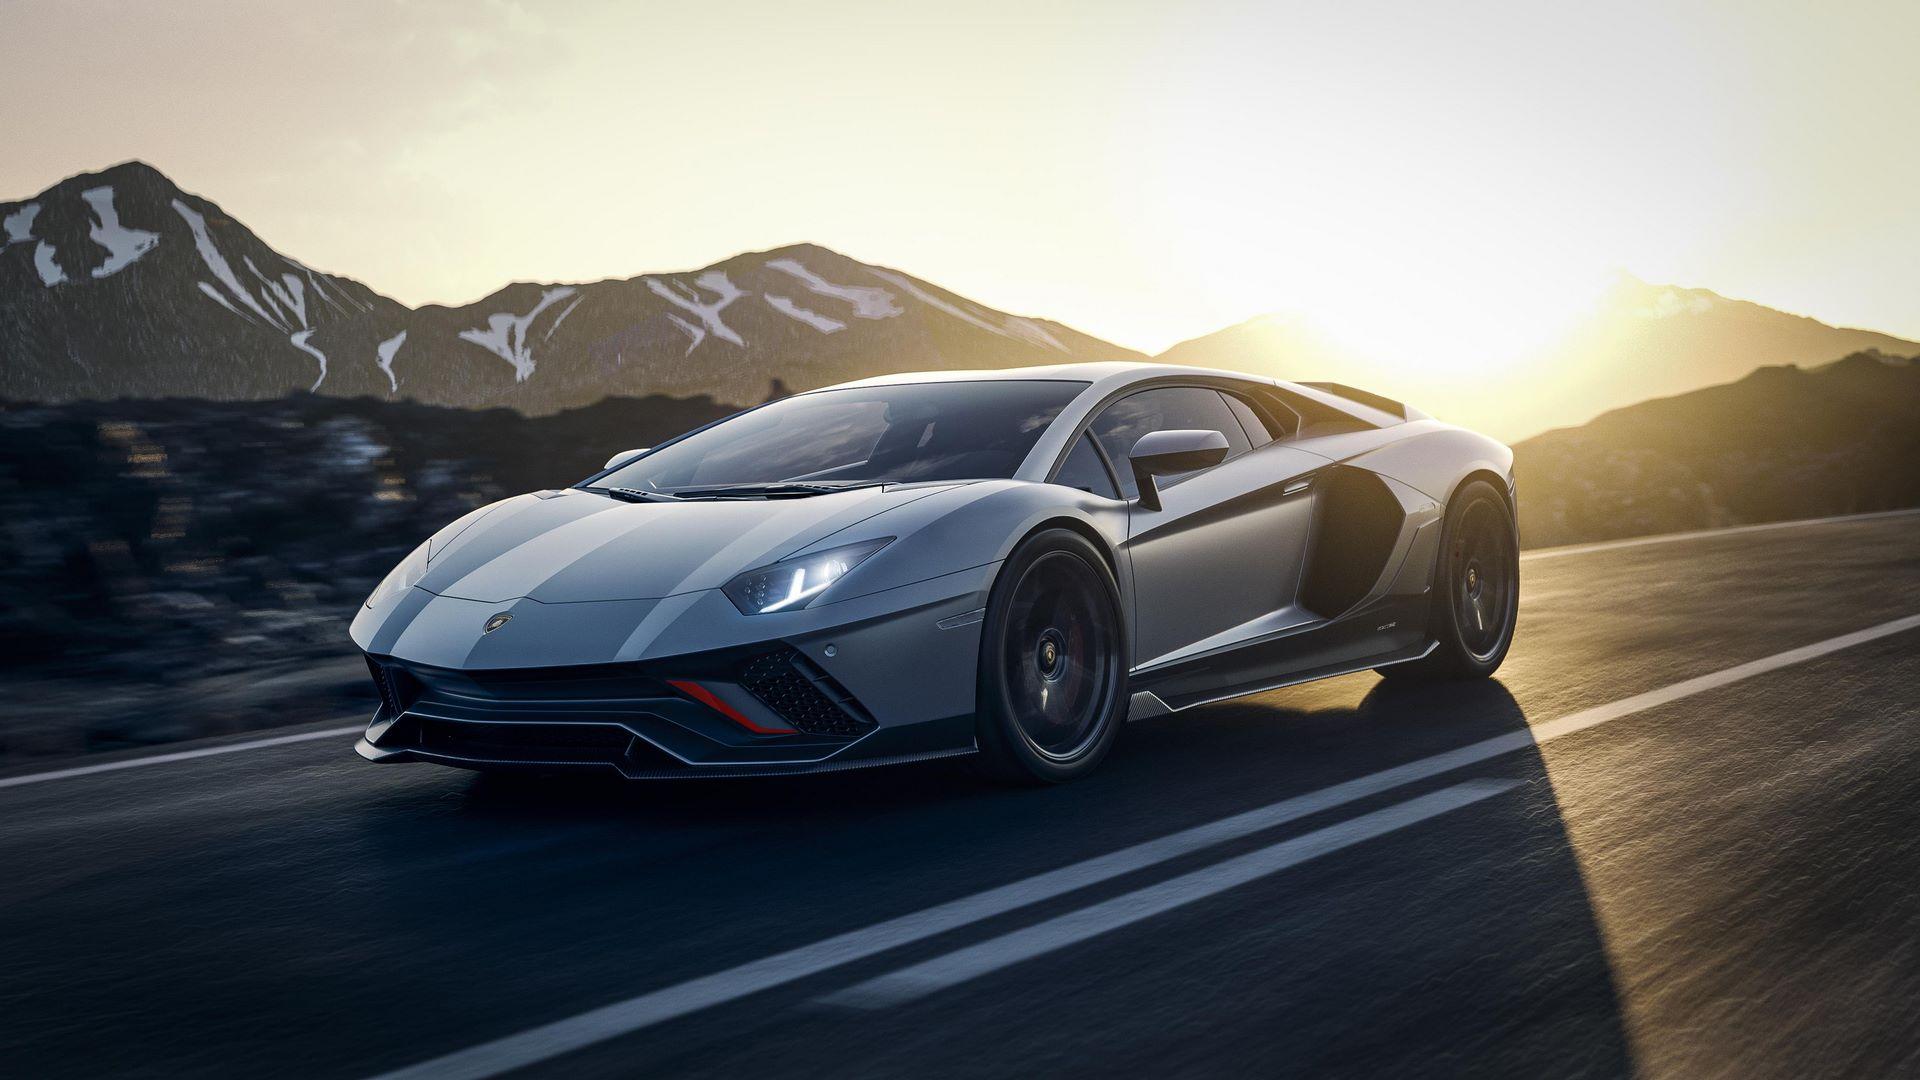 Lamborghini-Aventador-LP780-4-Ultimae-10